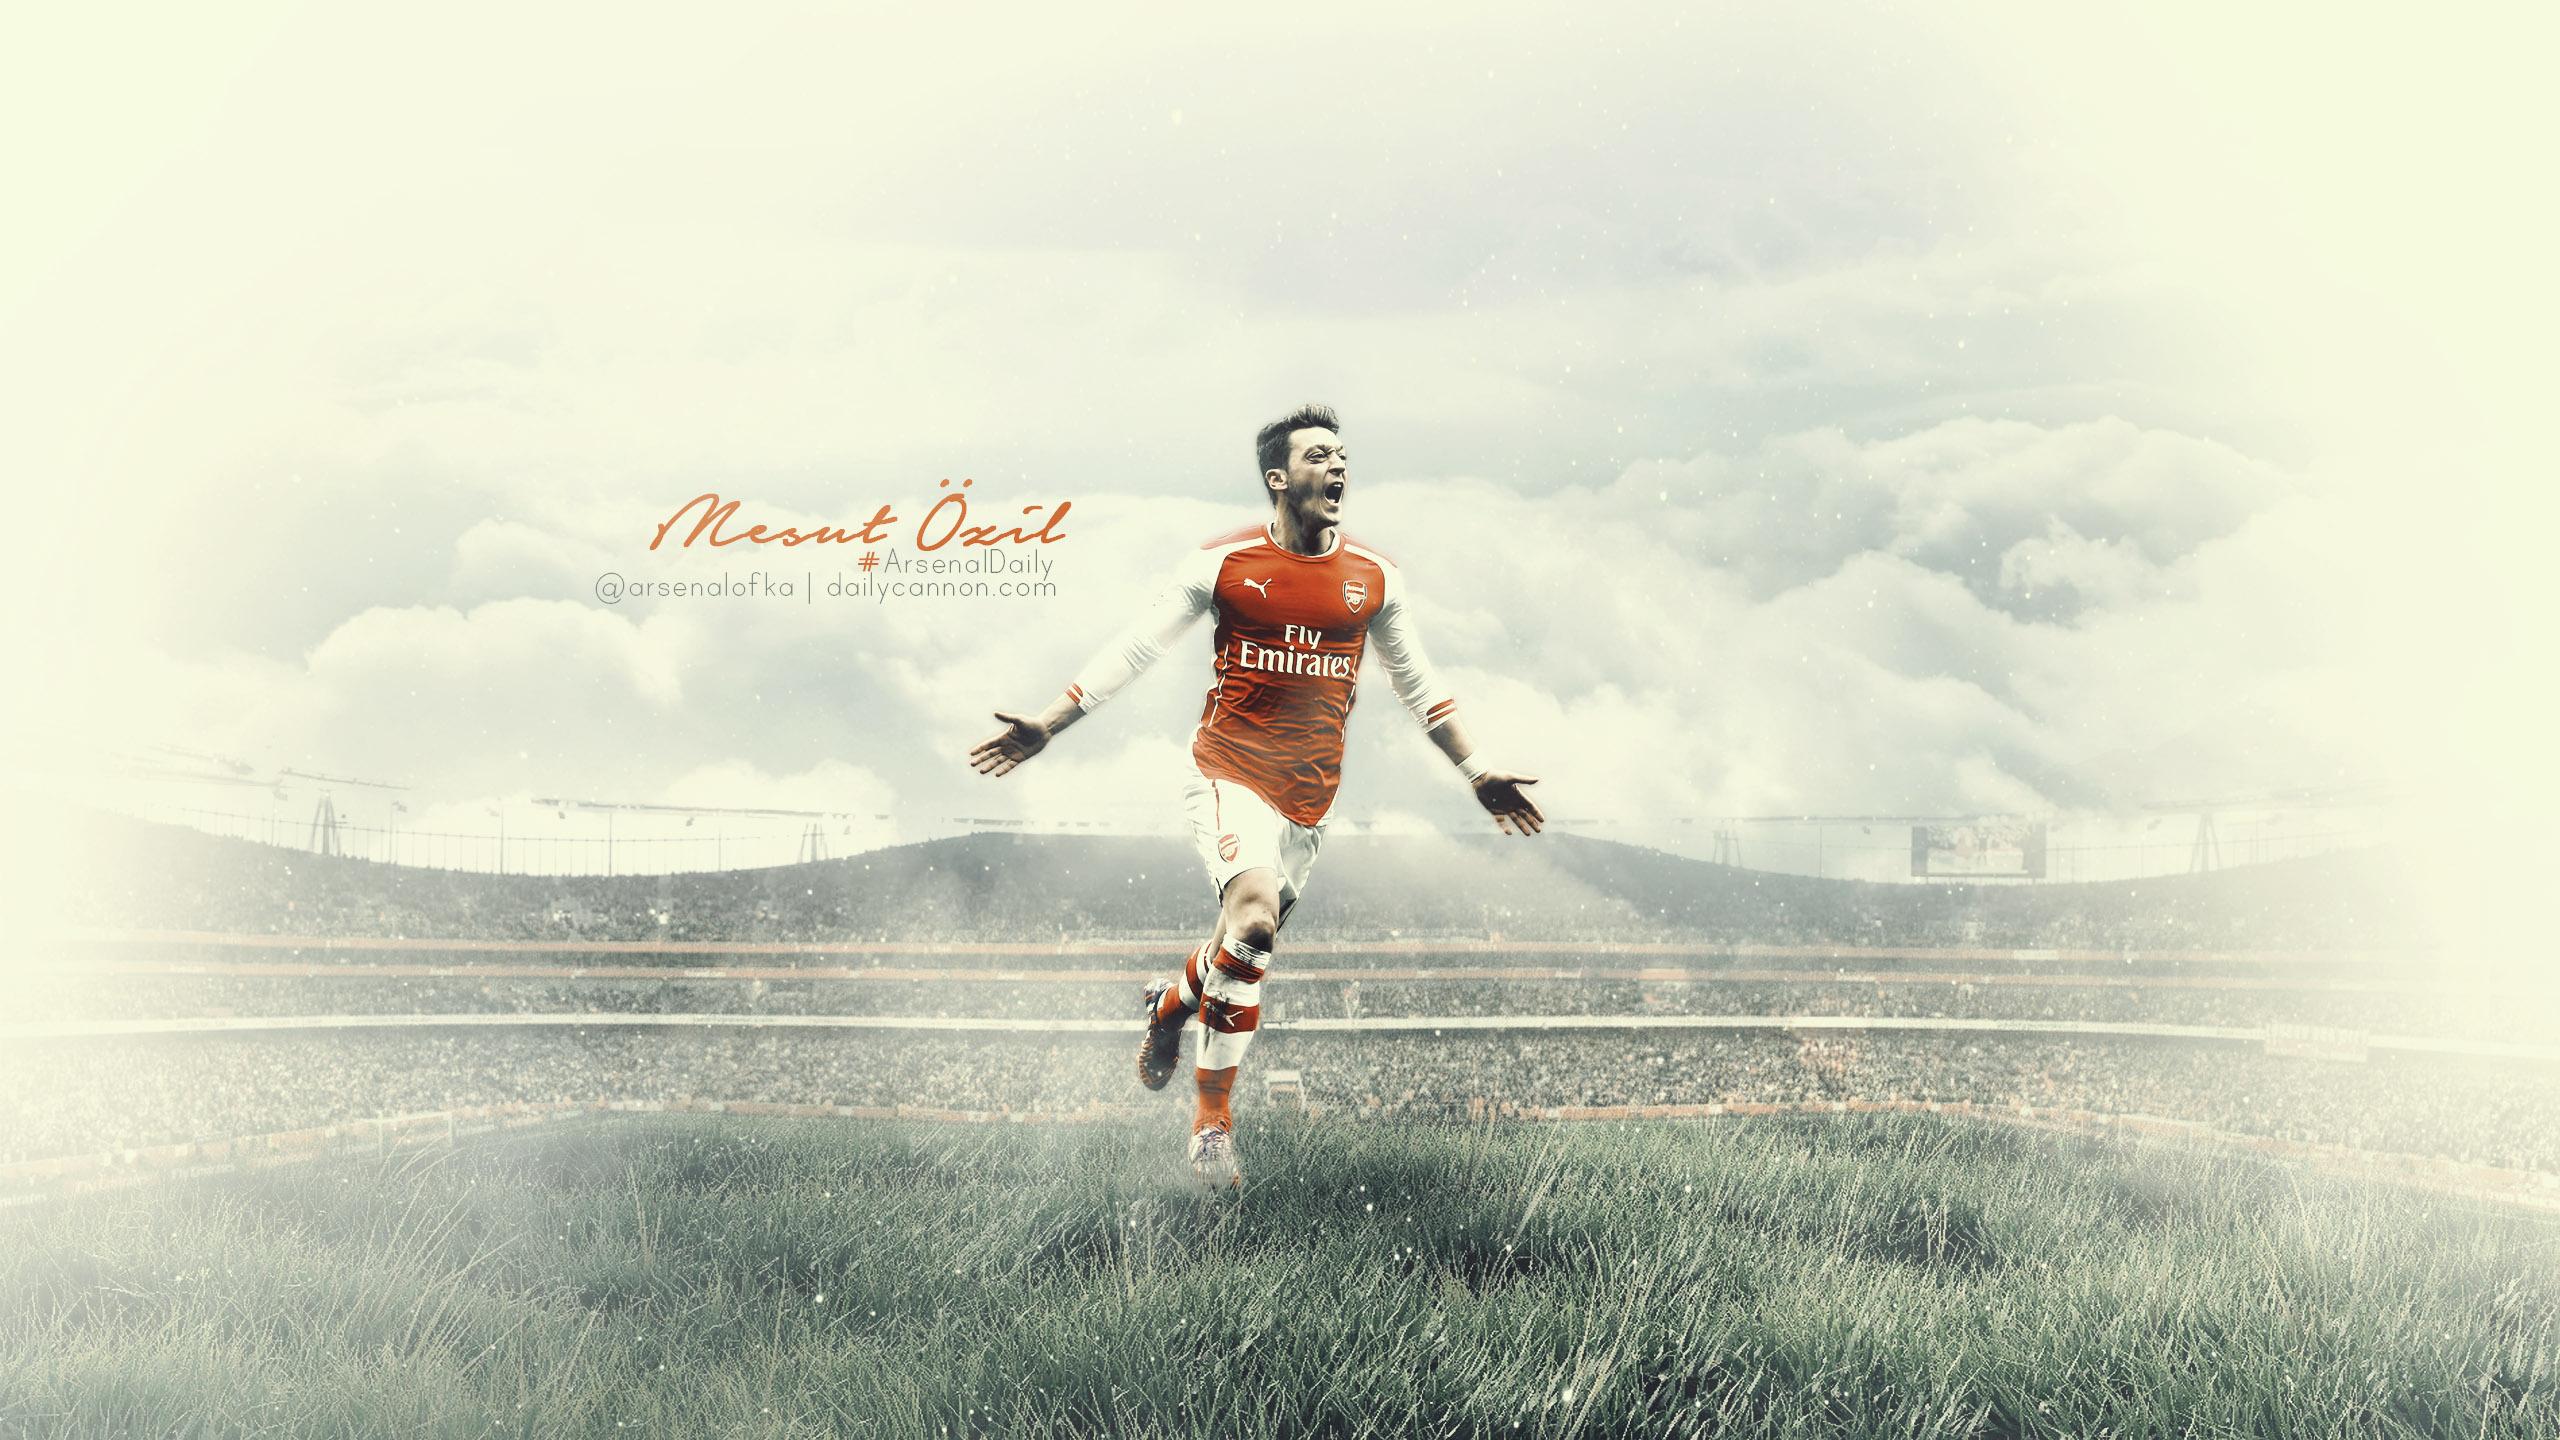 Mesut Ozil Wallpaper Header And Cover